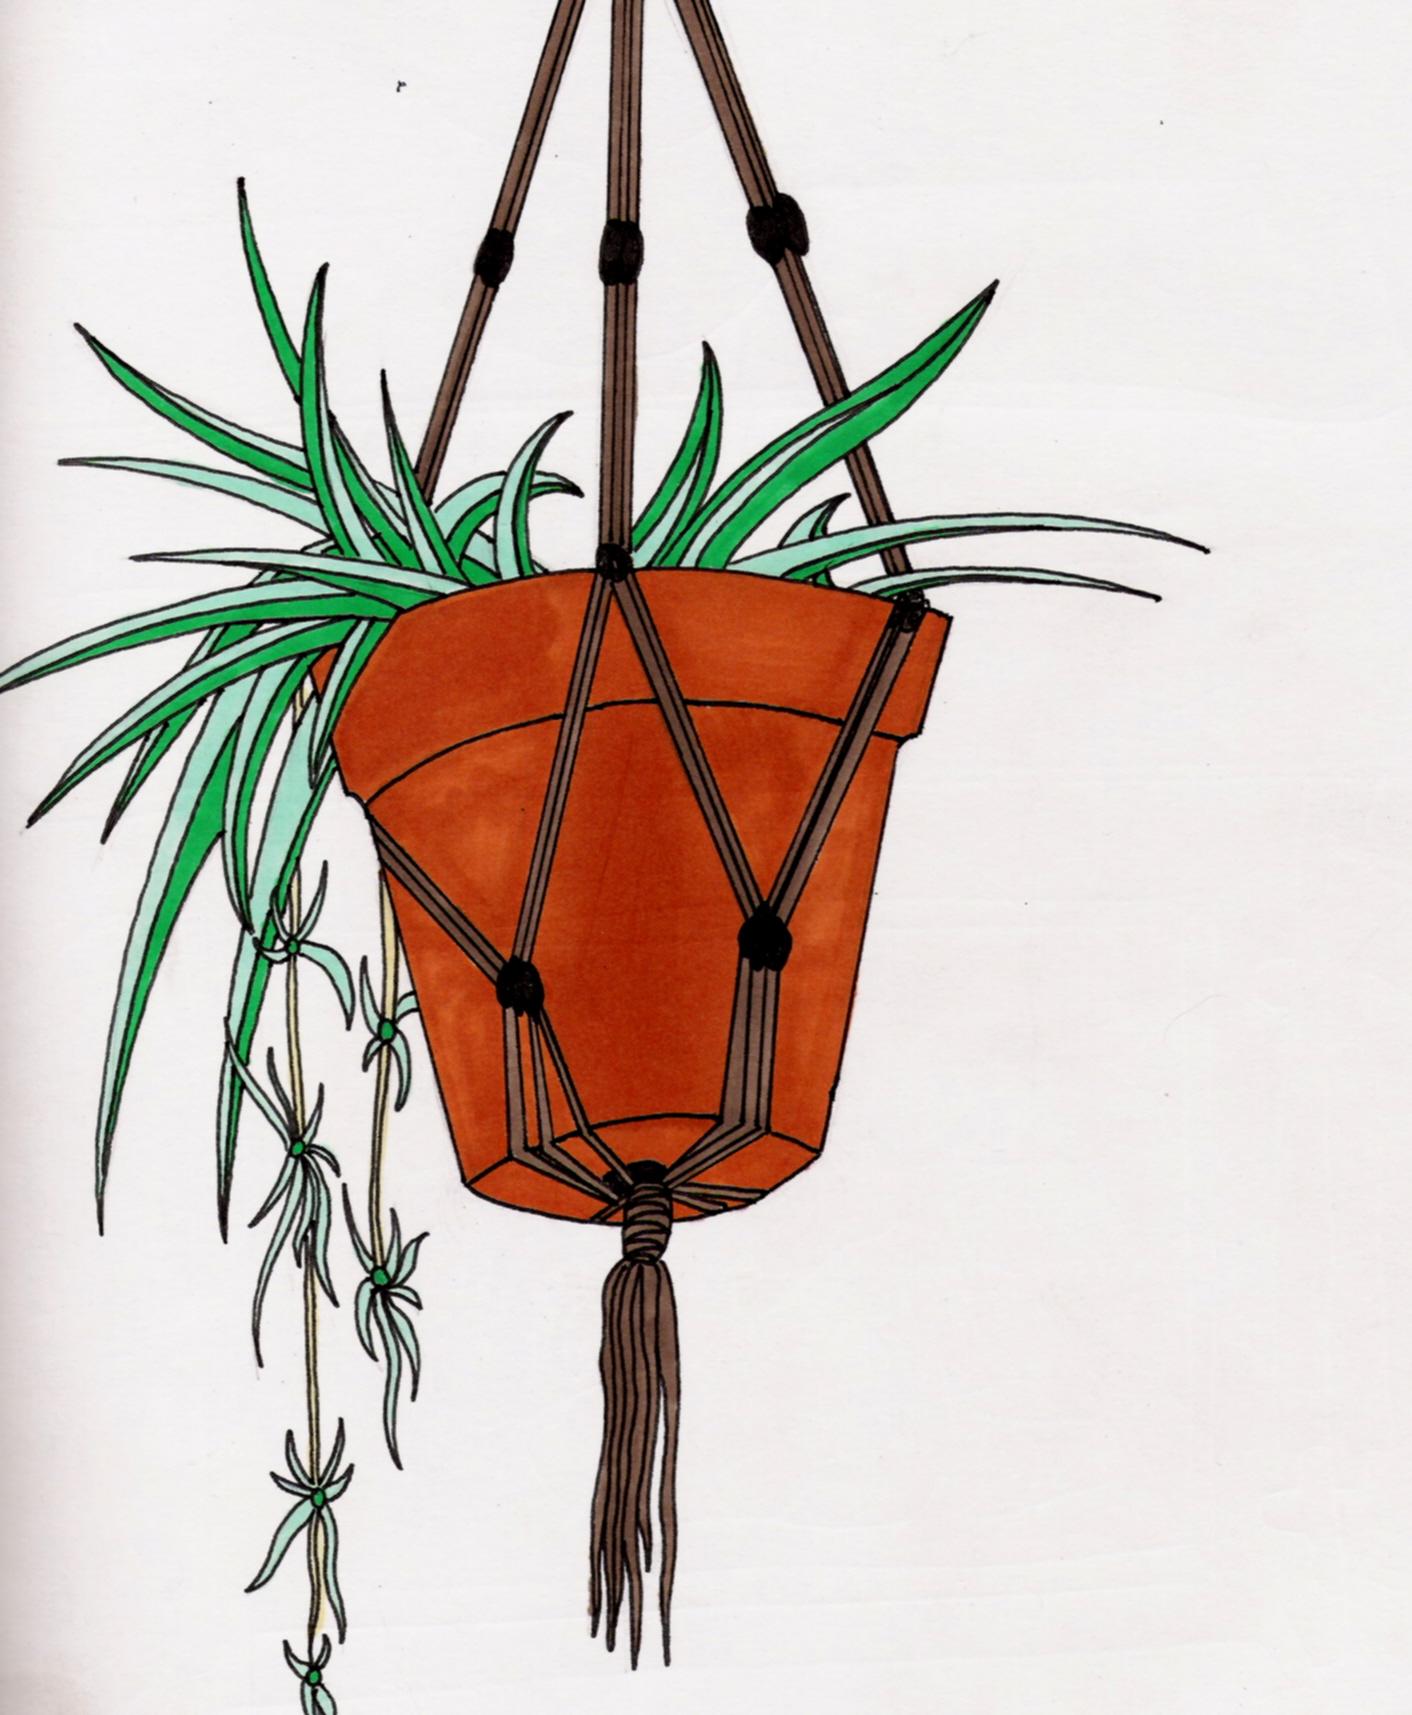 Spider Plant By Drecula On Deviantart